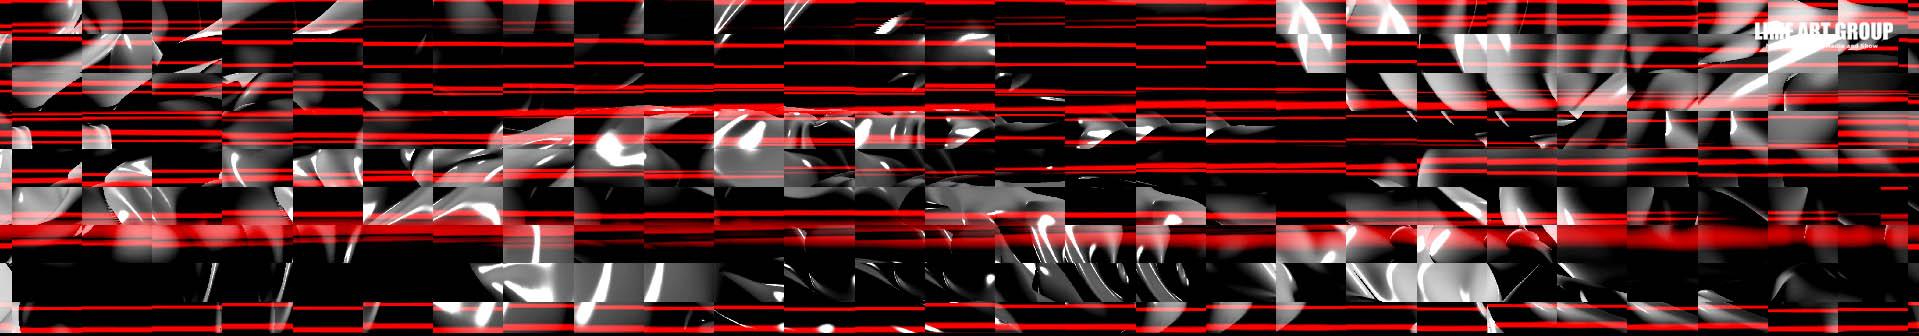 candy vj loops motion background video loop 16